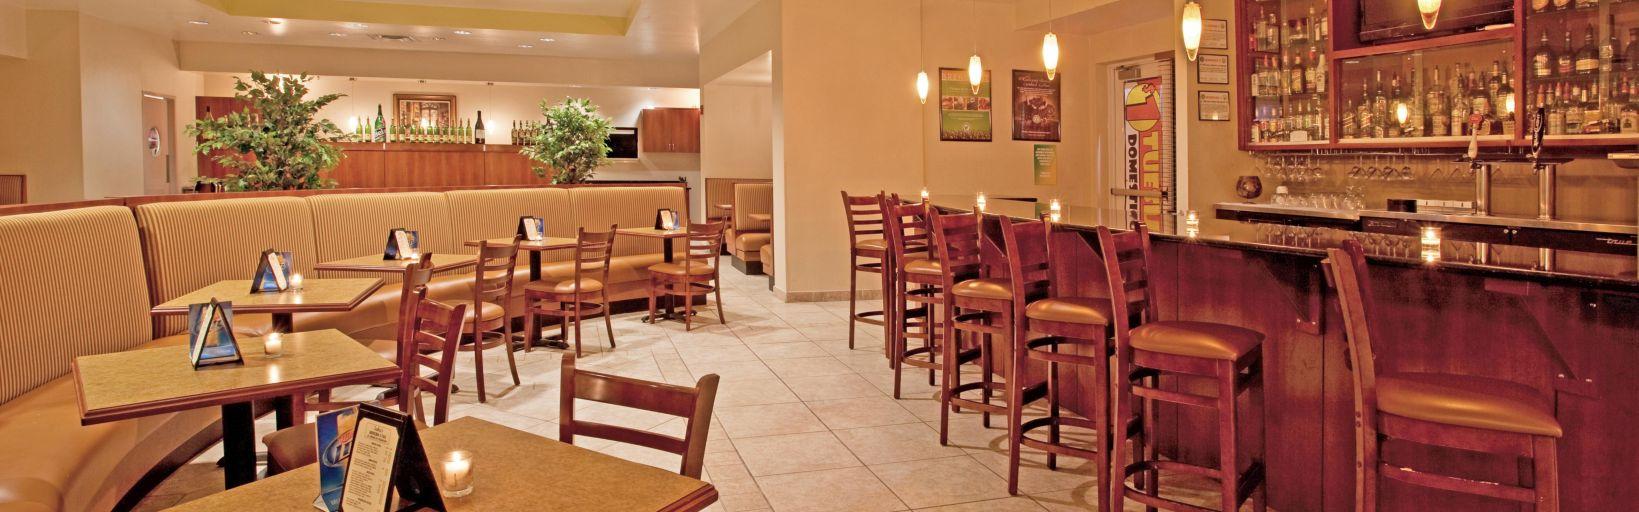 Restaurants Near Maumee Bay State Park Best